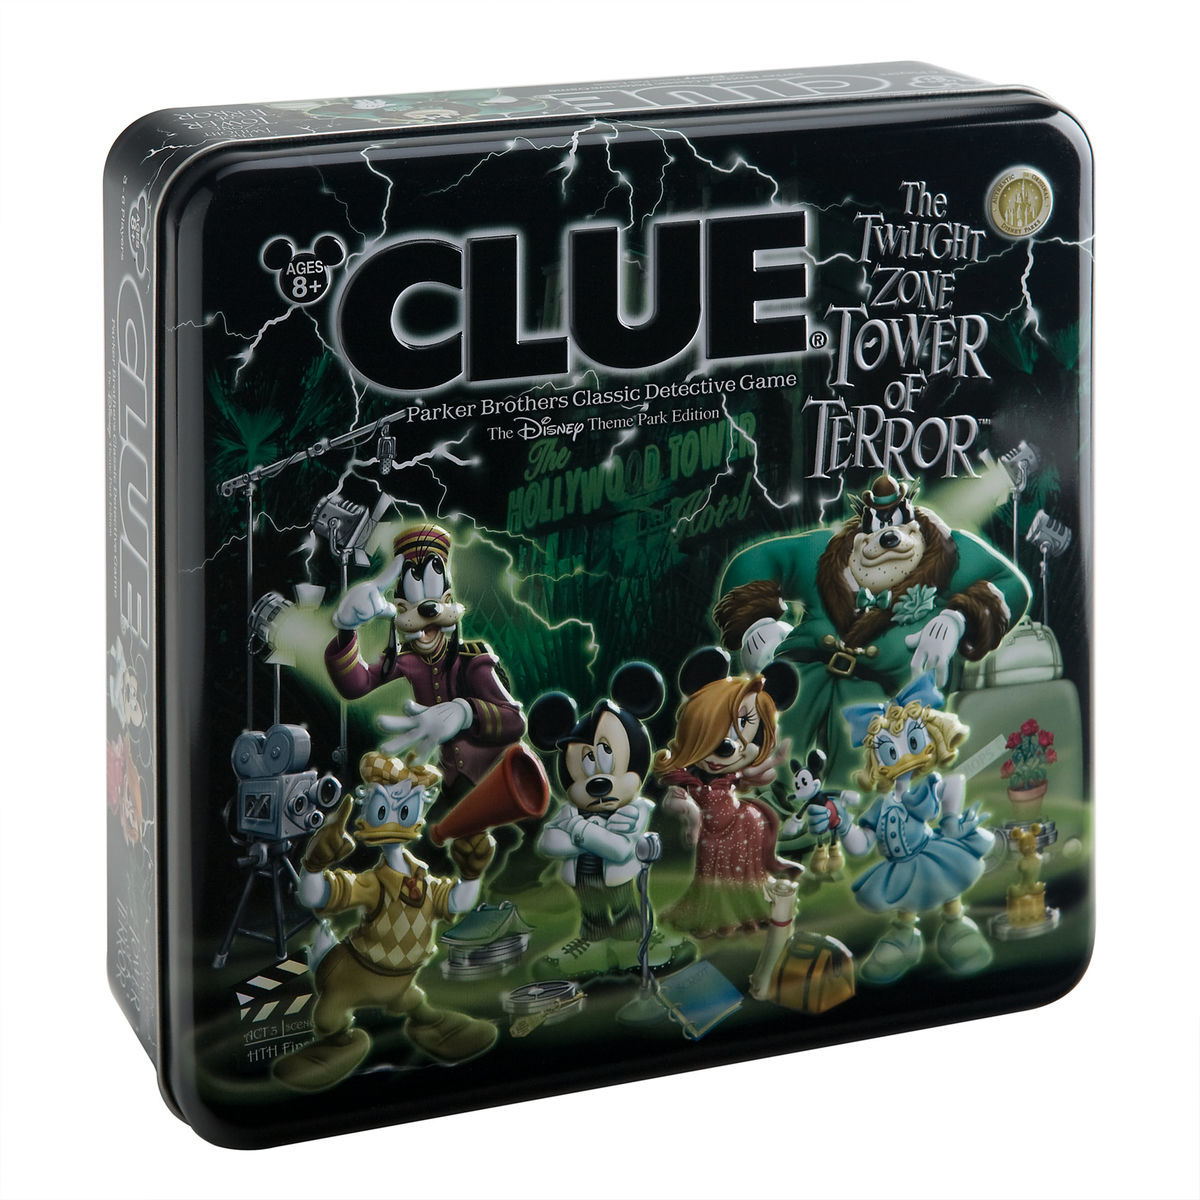 Clue The Twilight Zone Tower Of Terror Disney Theme Park Edition